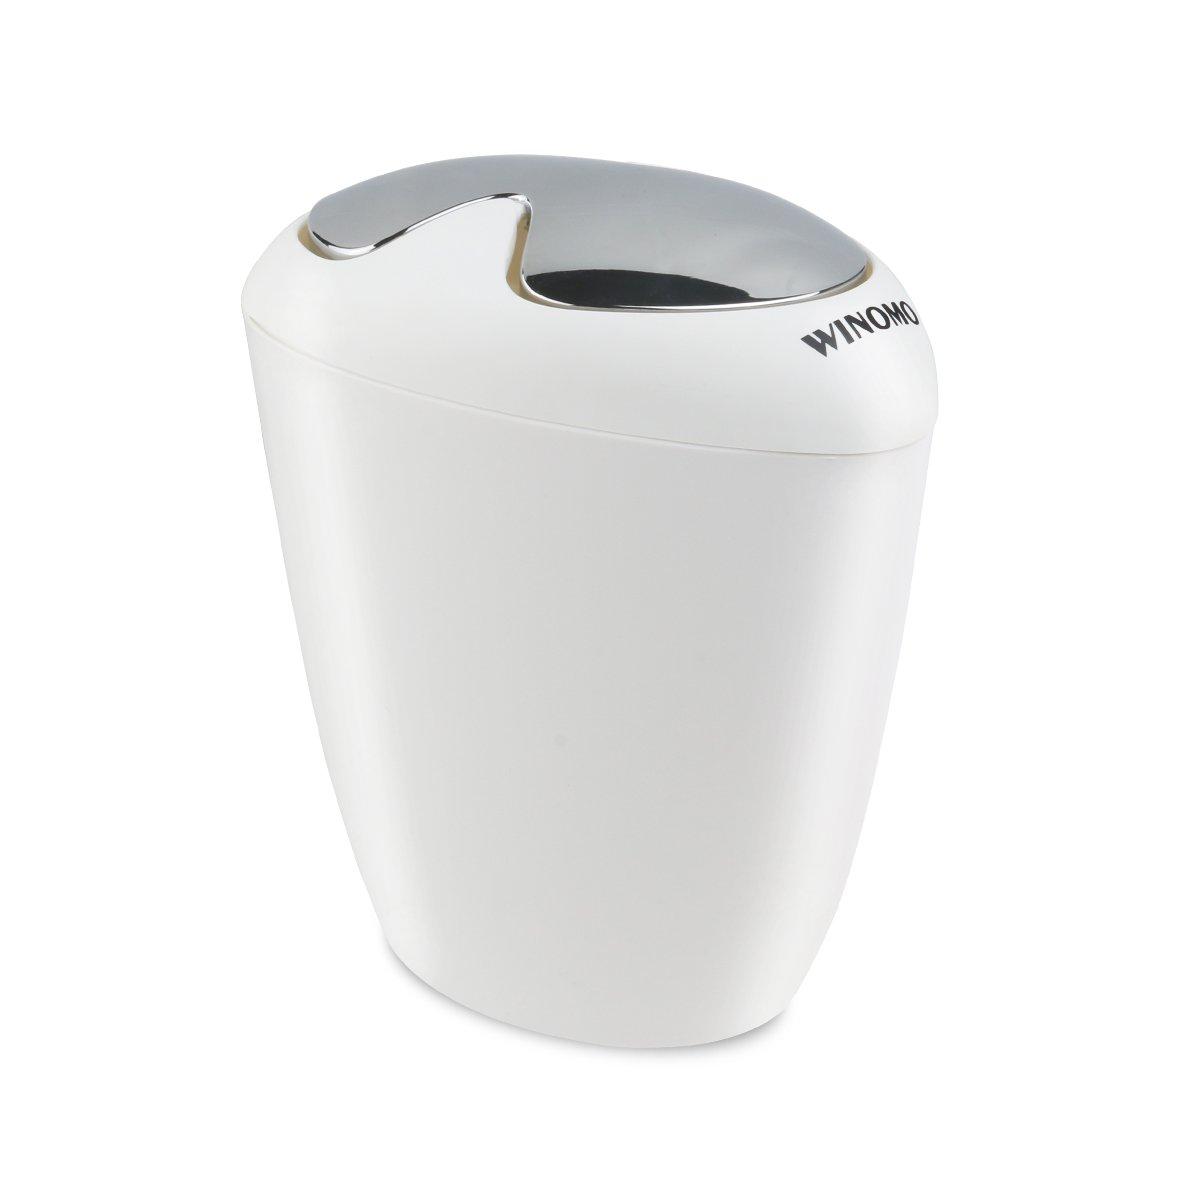 Amazon: Winomo Bathroom Trash Can 65 Liter 175 Gallon Trash With Swing  Lip: Home & Kitchen